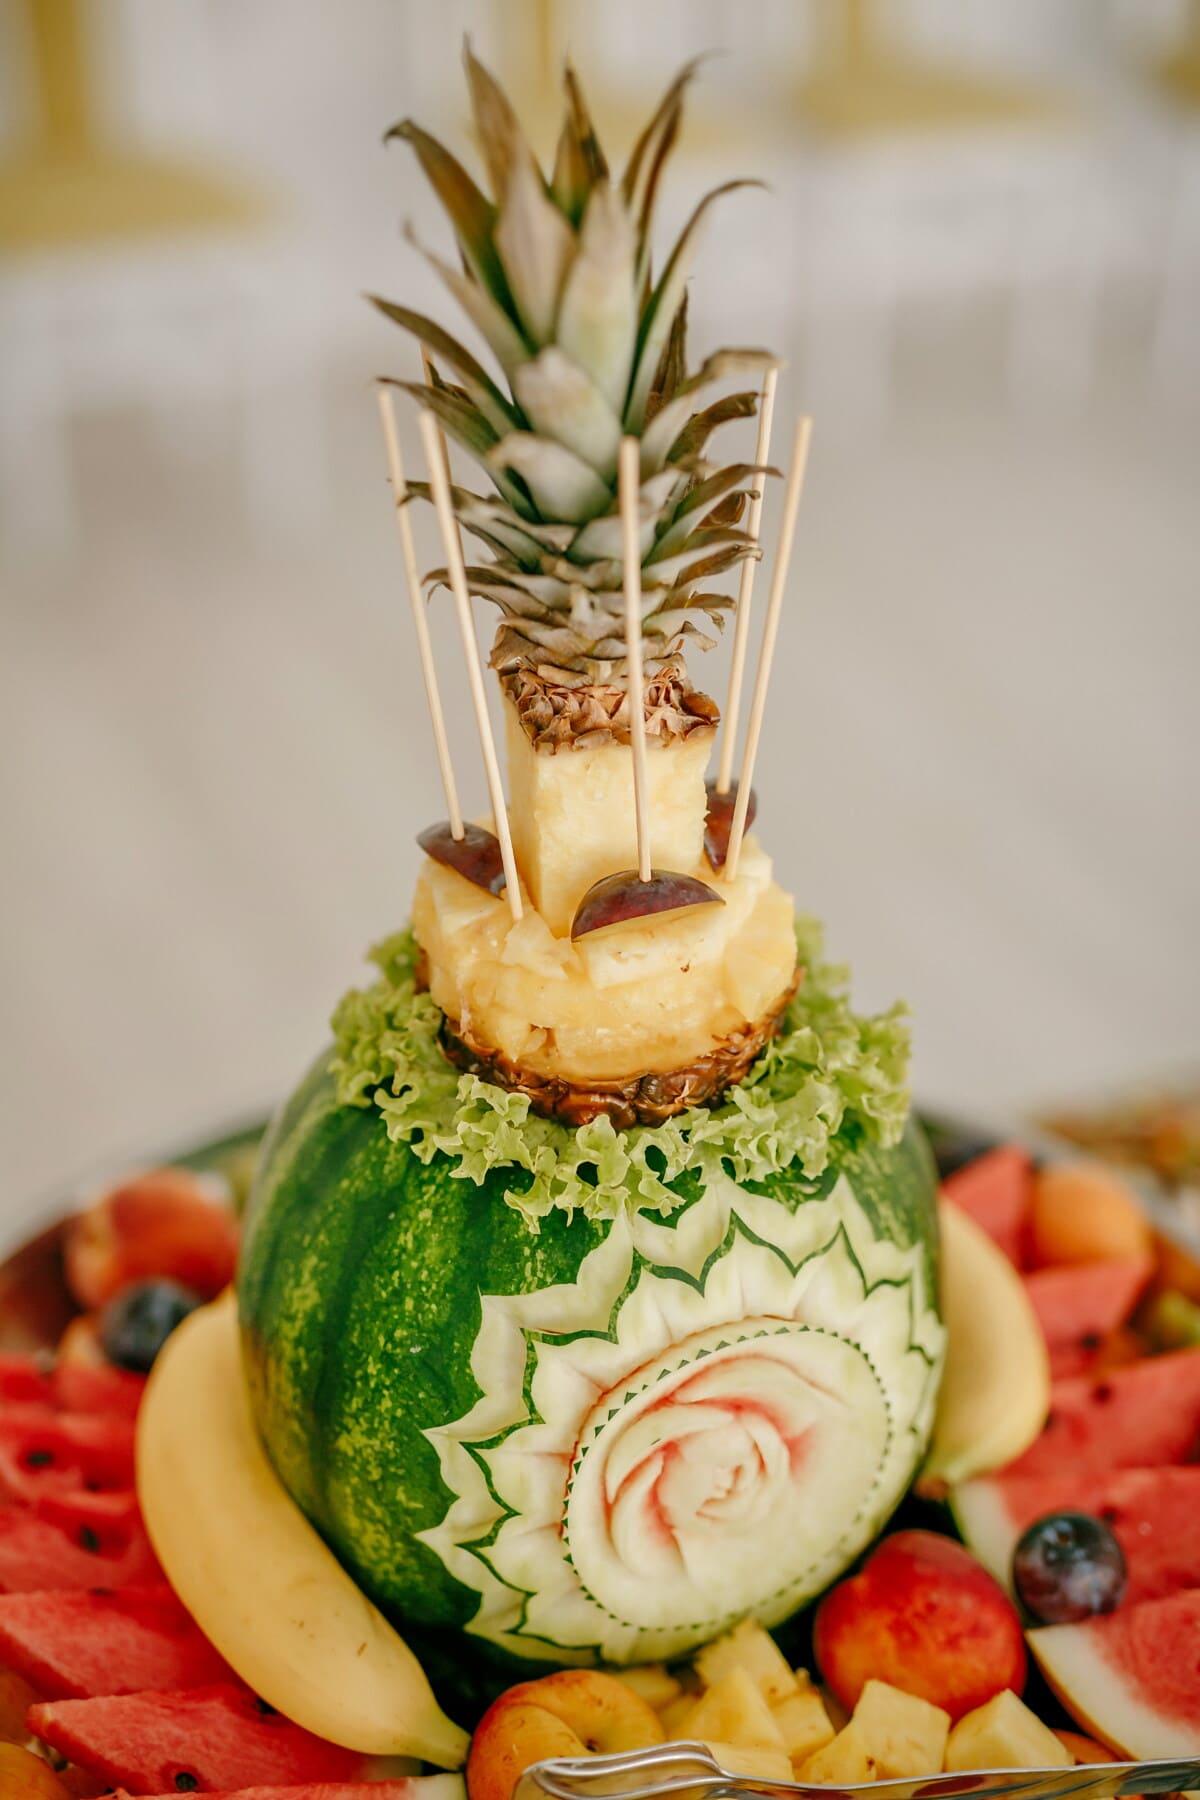 watermelon, carving, pineapple, decoration, fruit, citrus, banana, peach, food, delicious